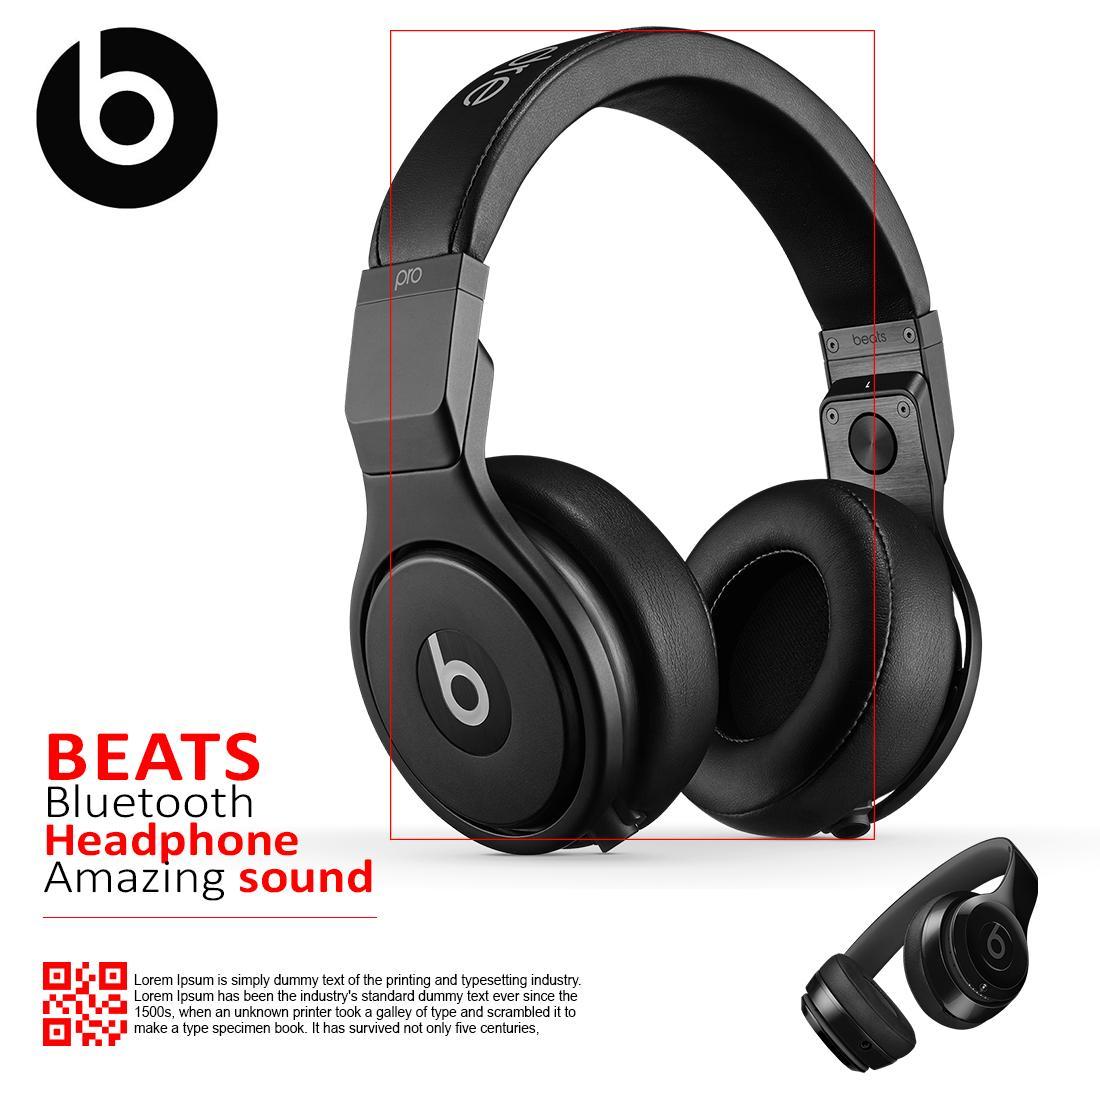 b4f4b3e513e Beats by Dr Dre Online Store in Pakistan - Daraz.pk